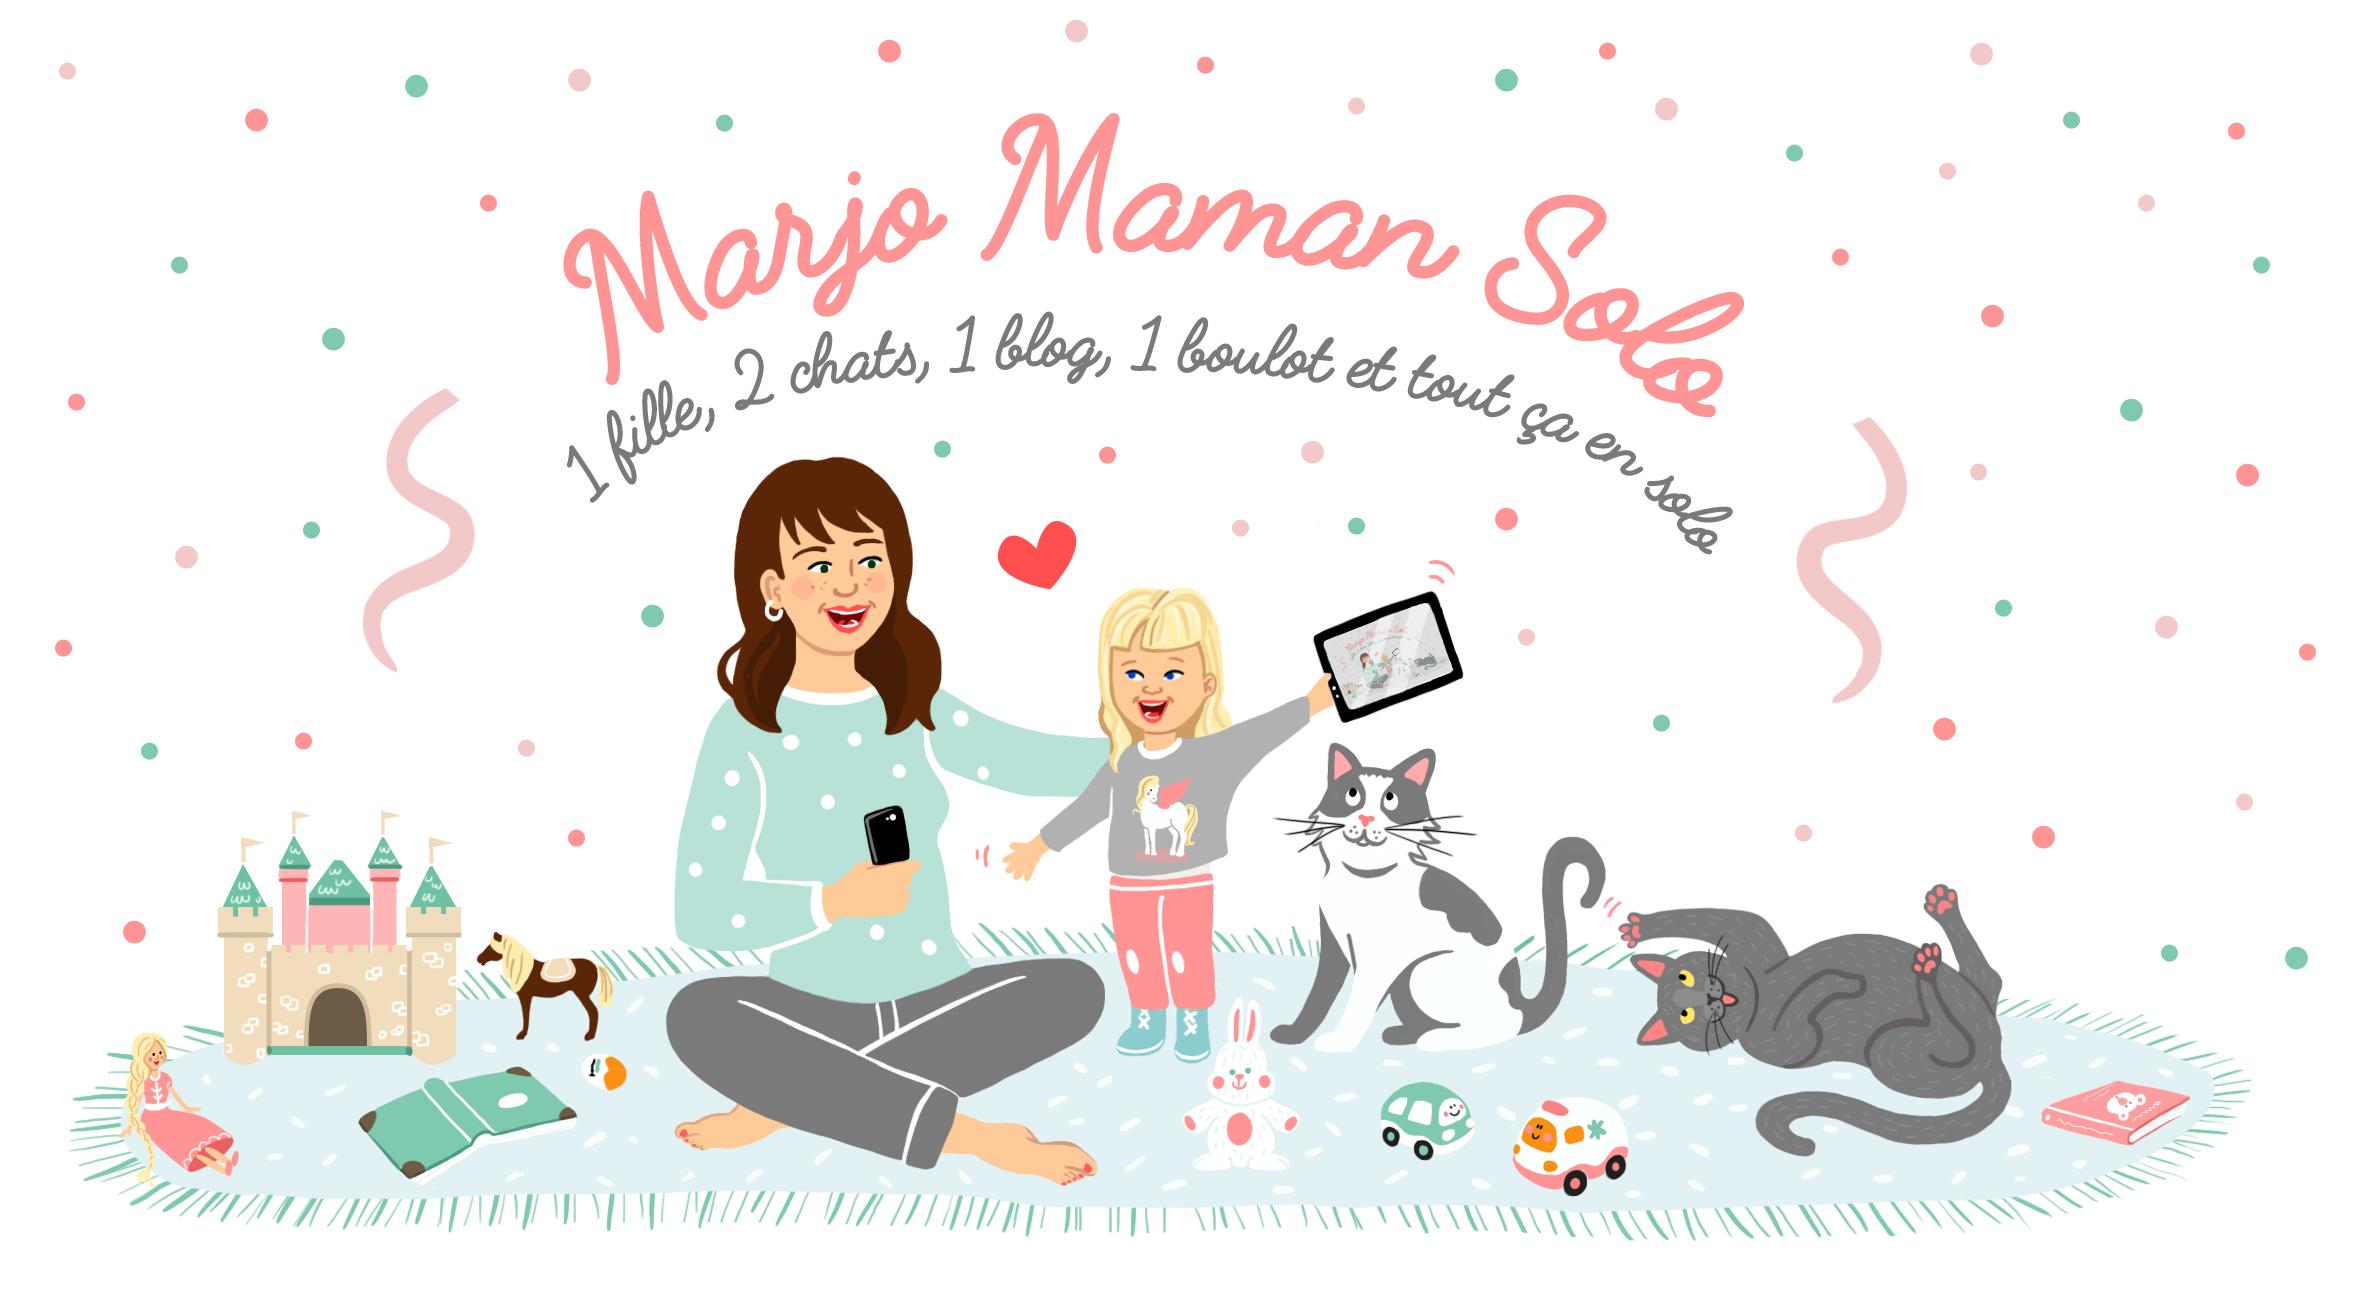 Bannière Blog - Marjo Maman Solo - Charlène Girodet